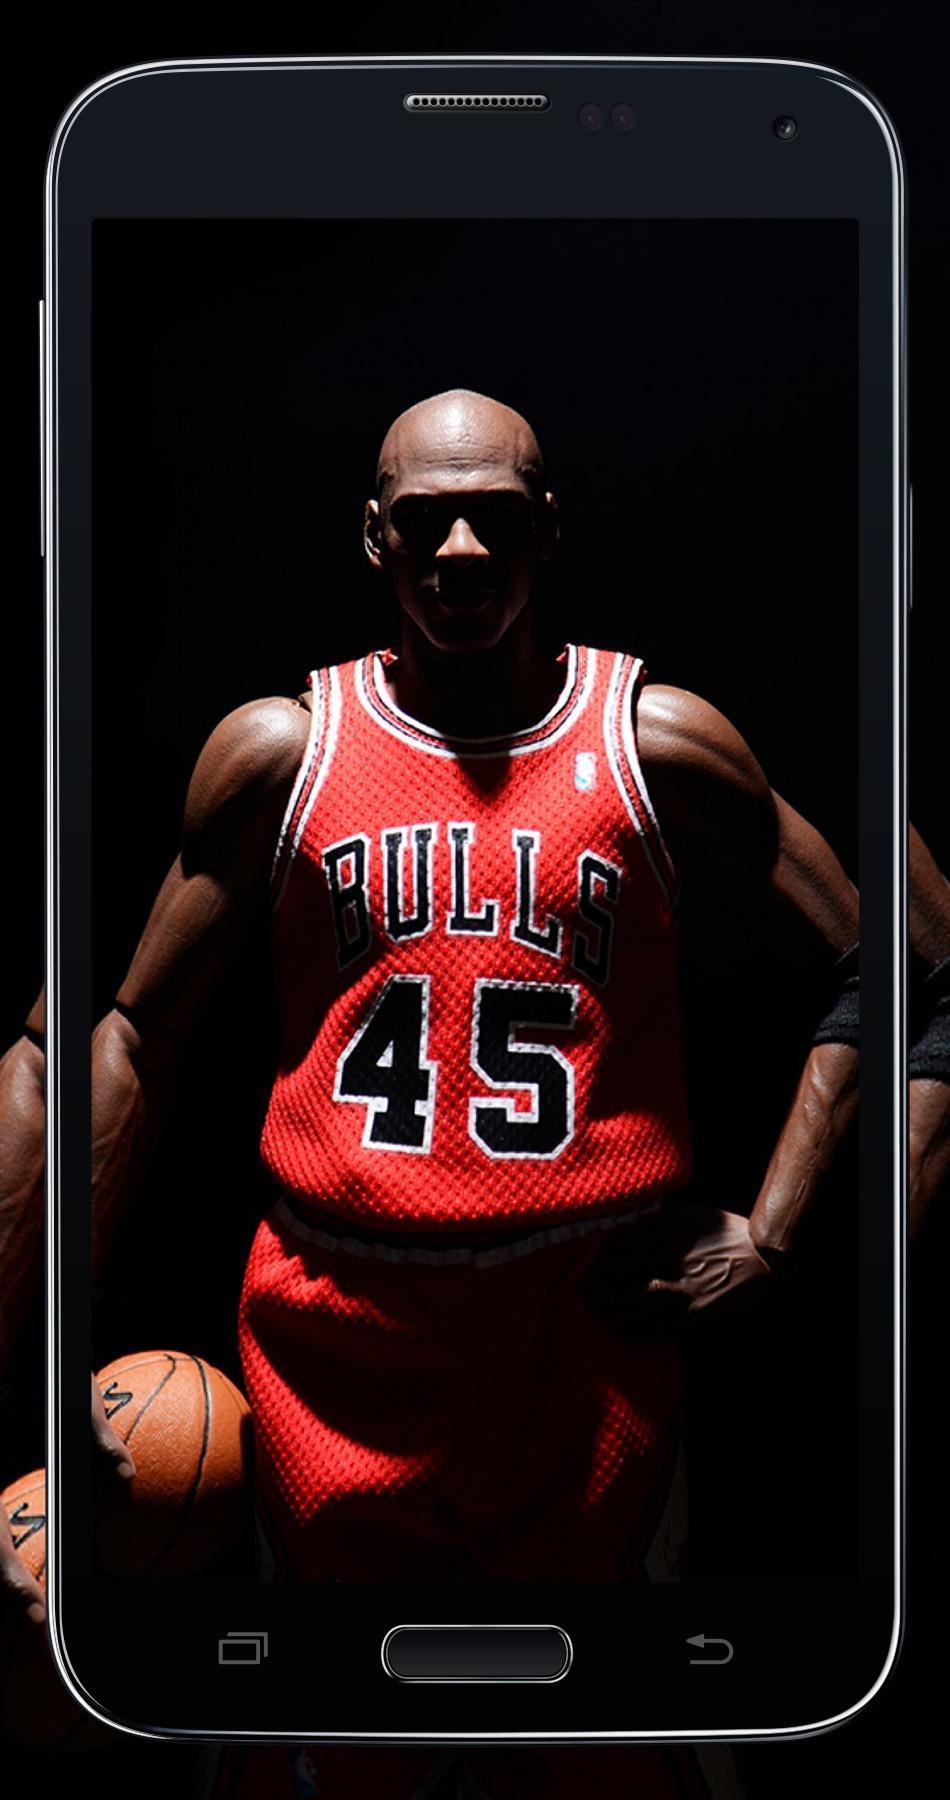 Hd Michael Jordan Wallpapers For Android Apk Download